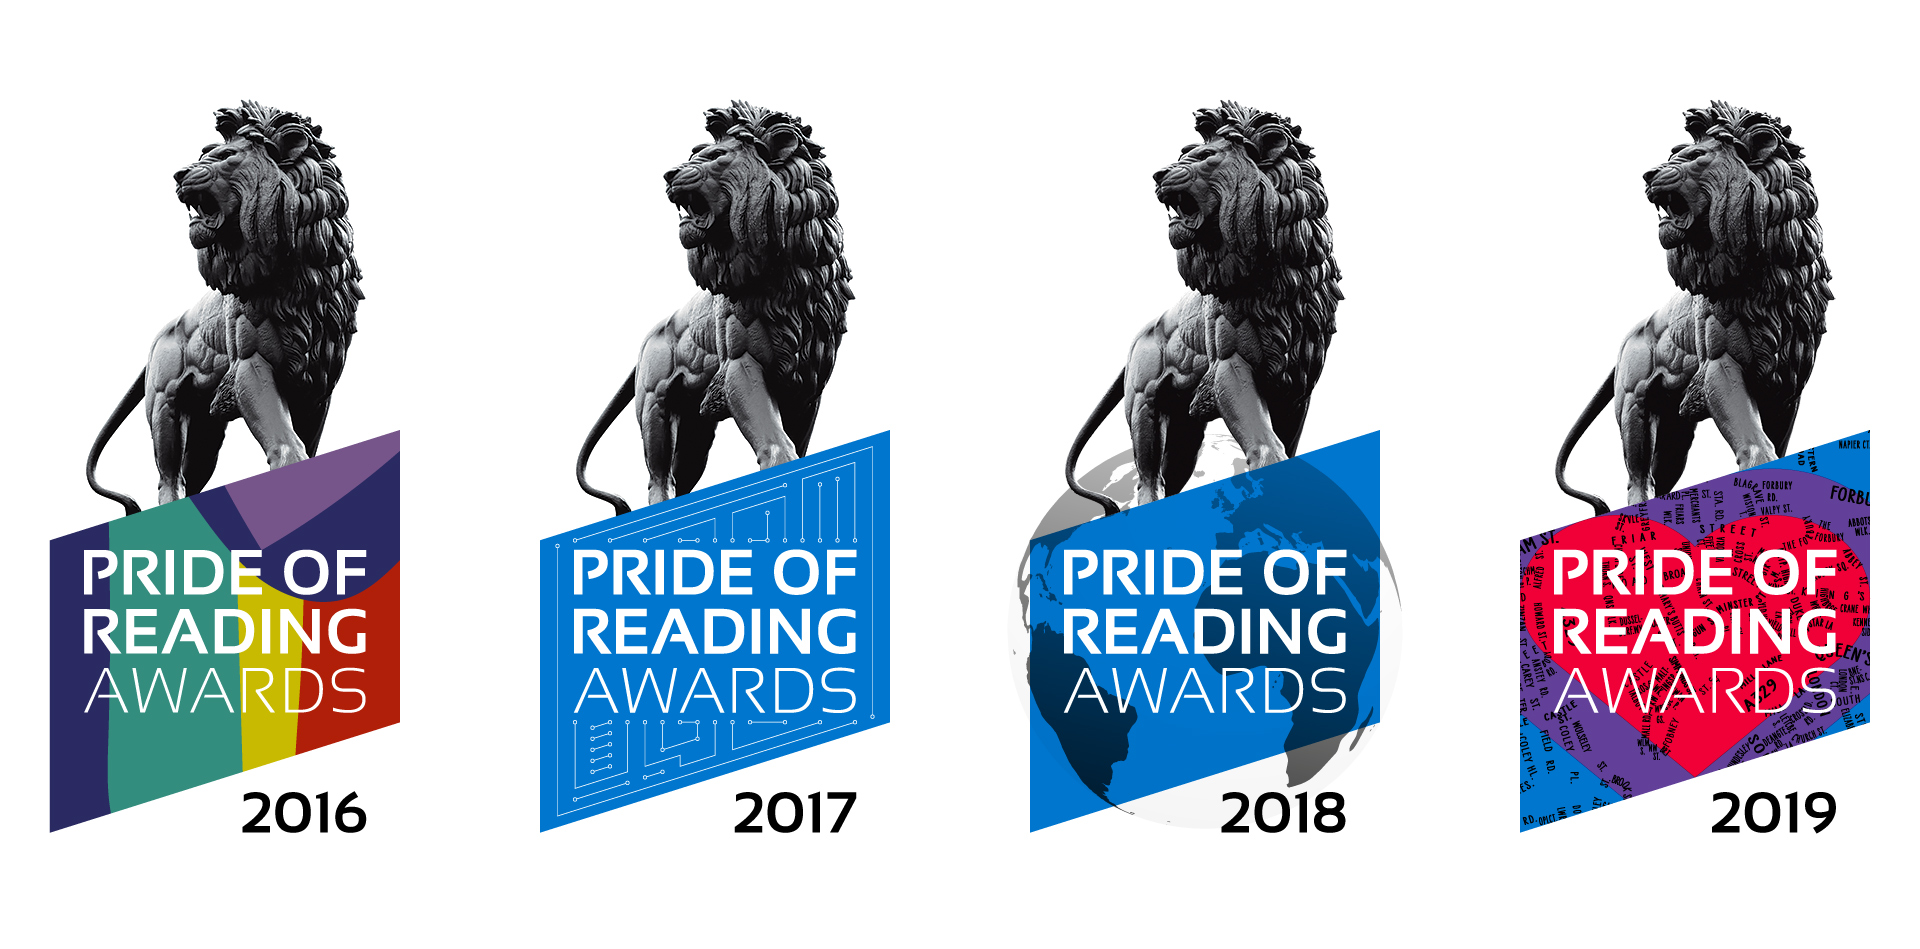 Pride of Reading Awards 2019 Typographic Map